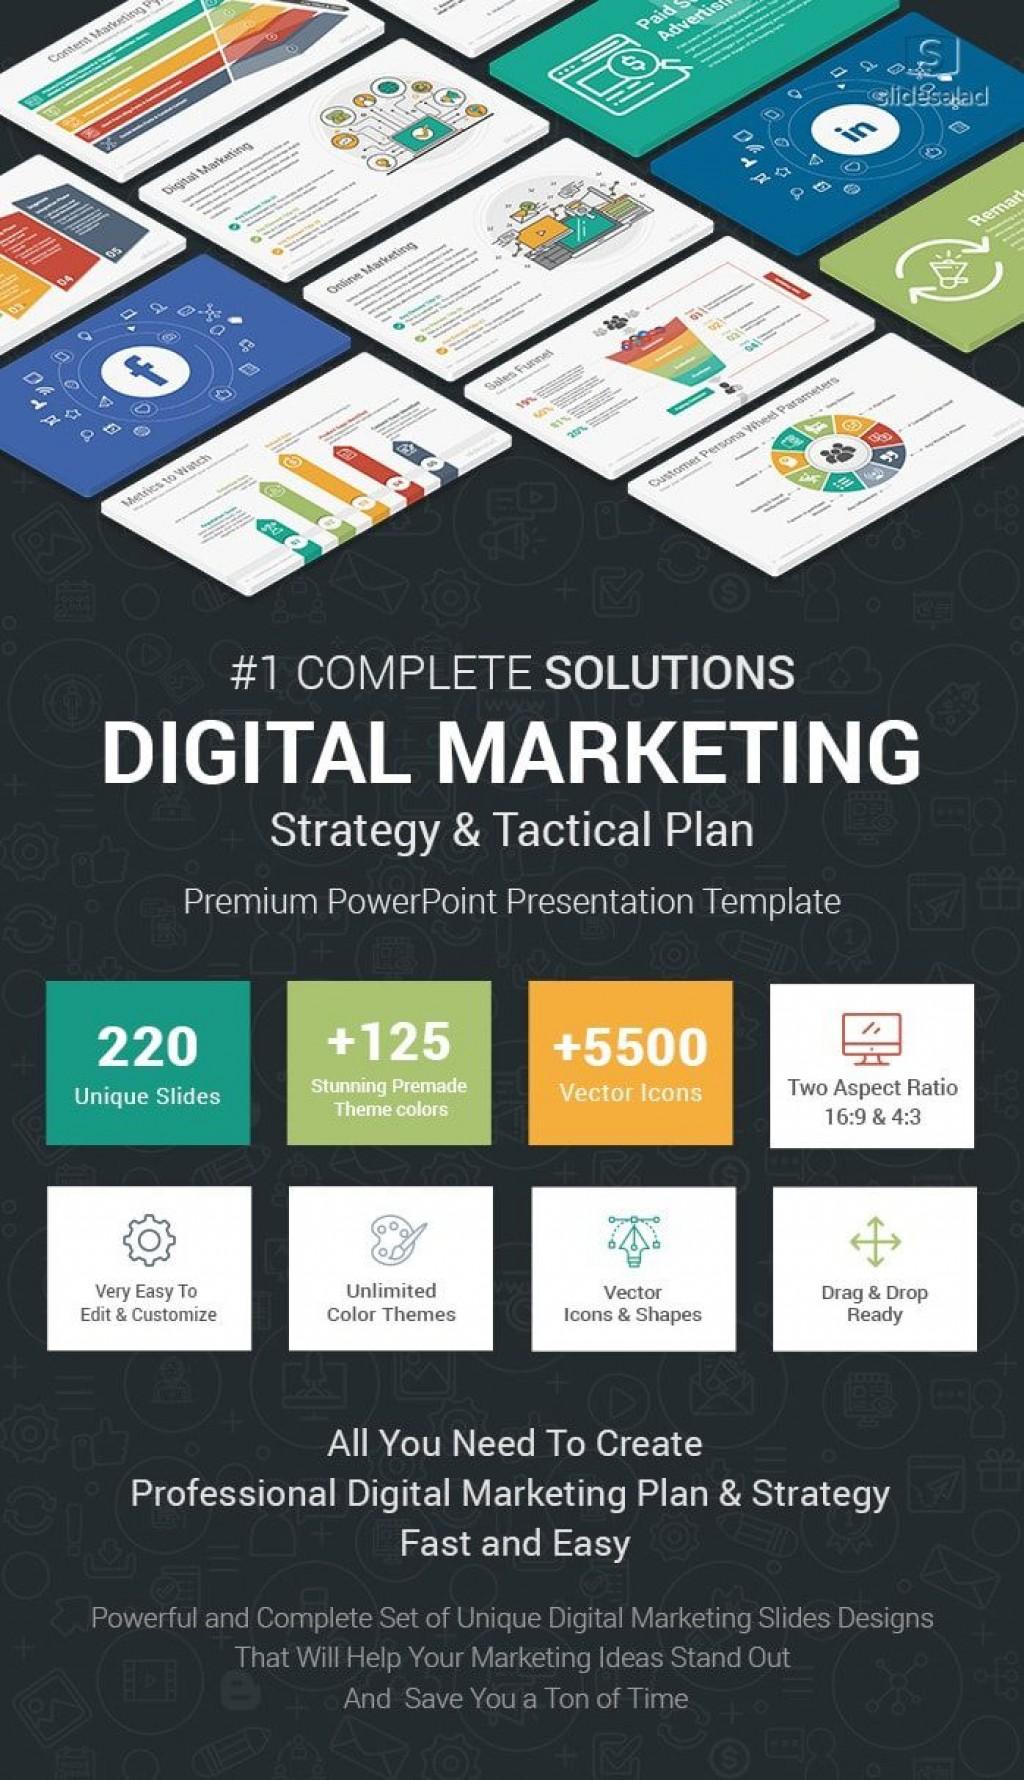 007 Impressive Digital Marketing Plan Example Ppt High Resolution Large